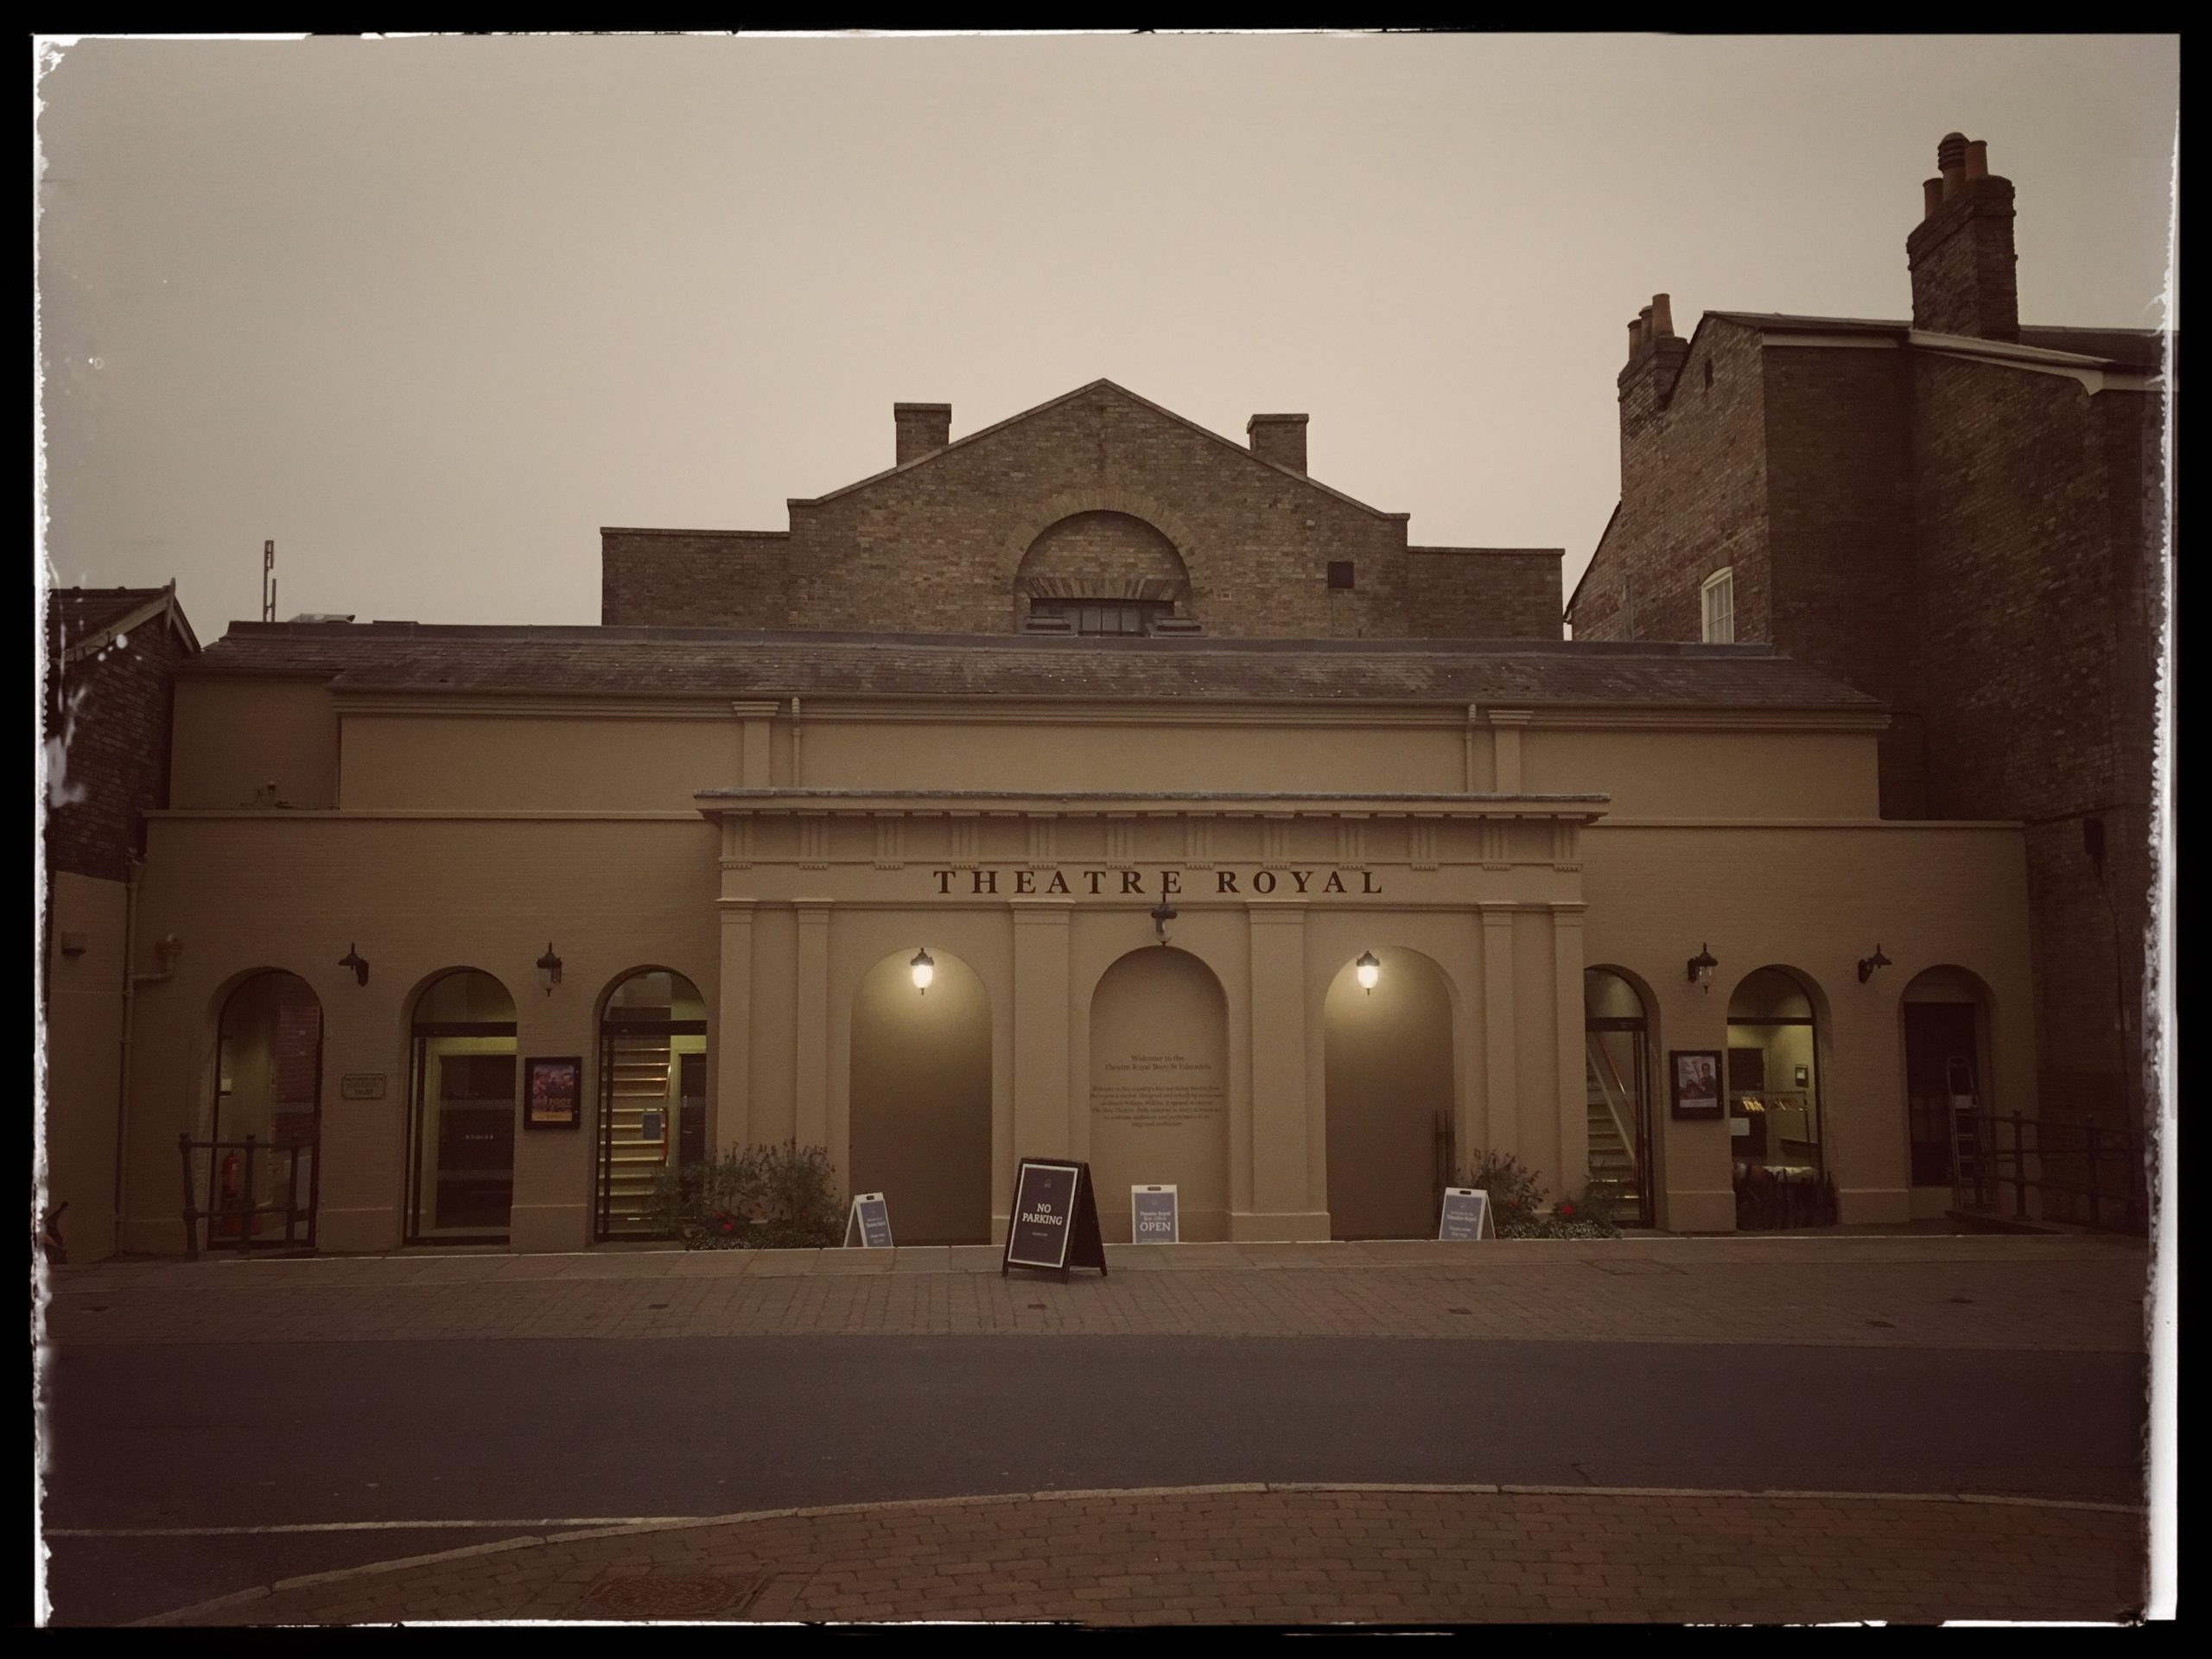 Front Facade of Theatre Royal Bury St Edmunds